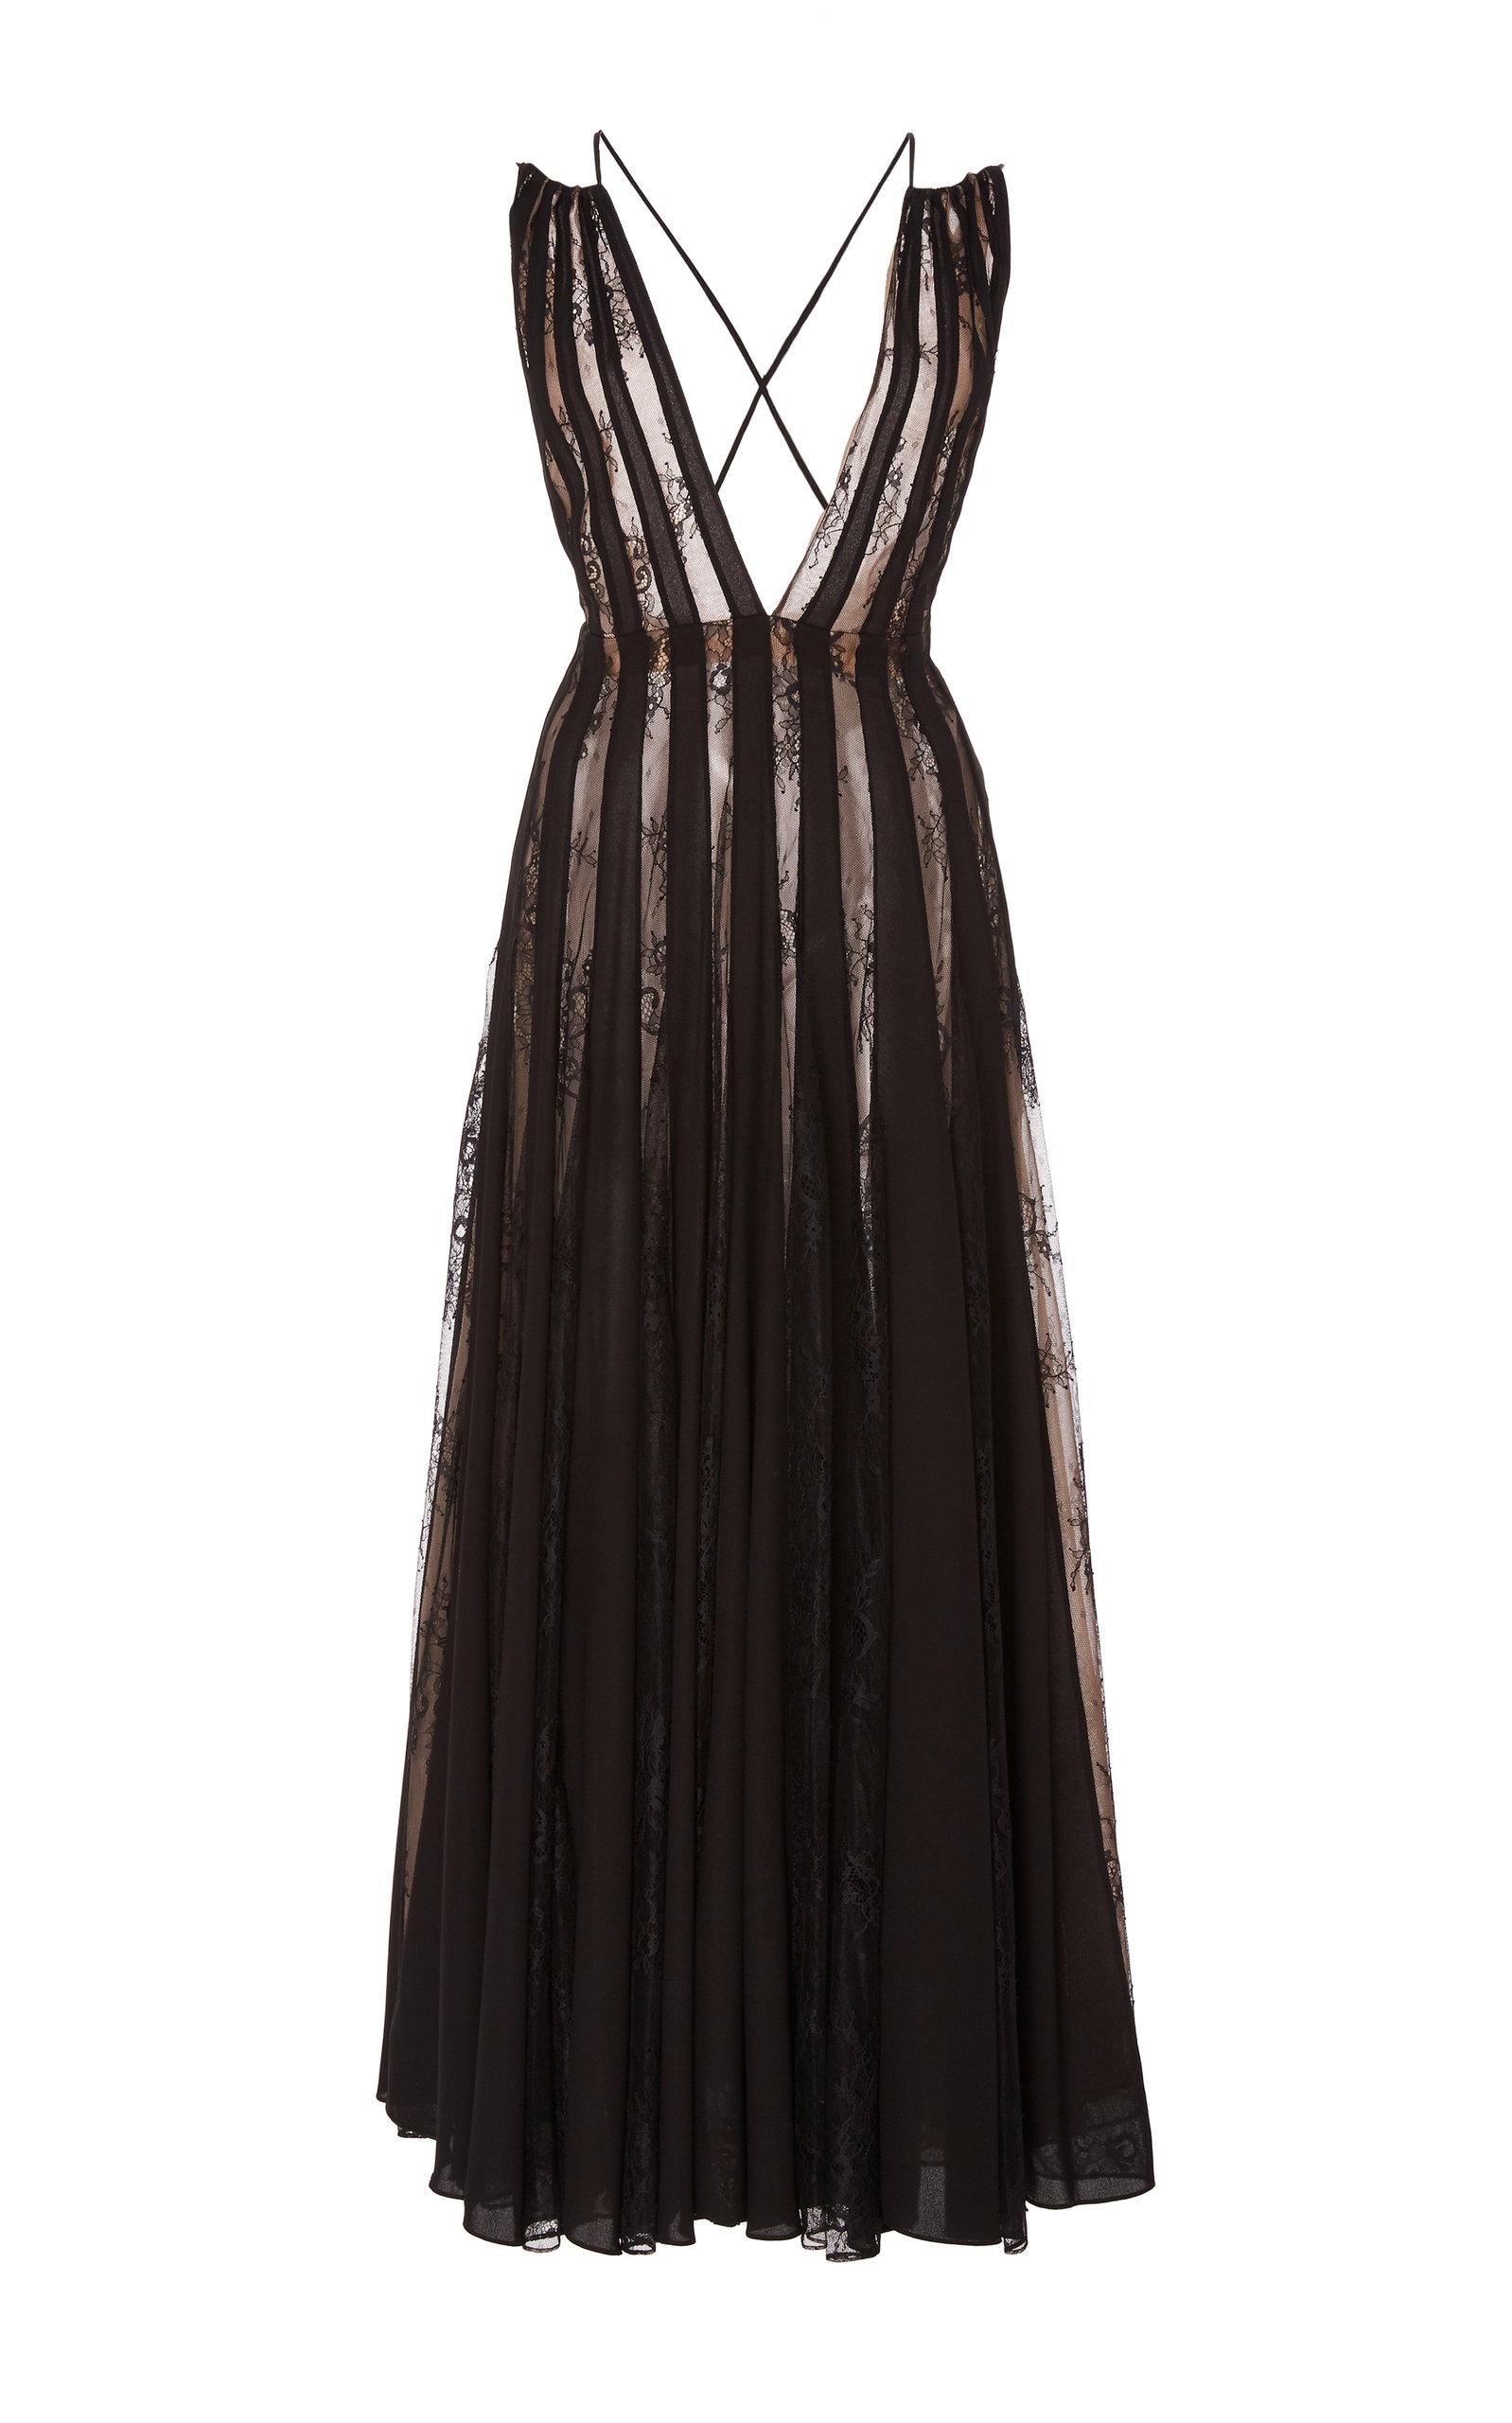 Buy Oscar de la Renta Lace-Paneled Pleated Chiffon Midi Dress online, shop Oscar de la Renta at the best price